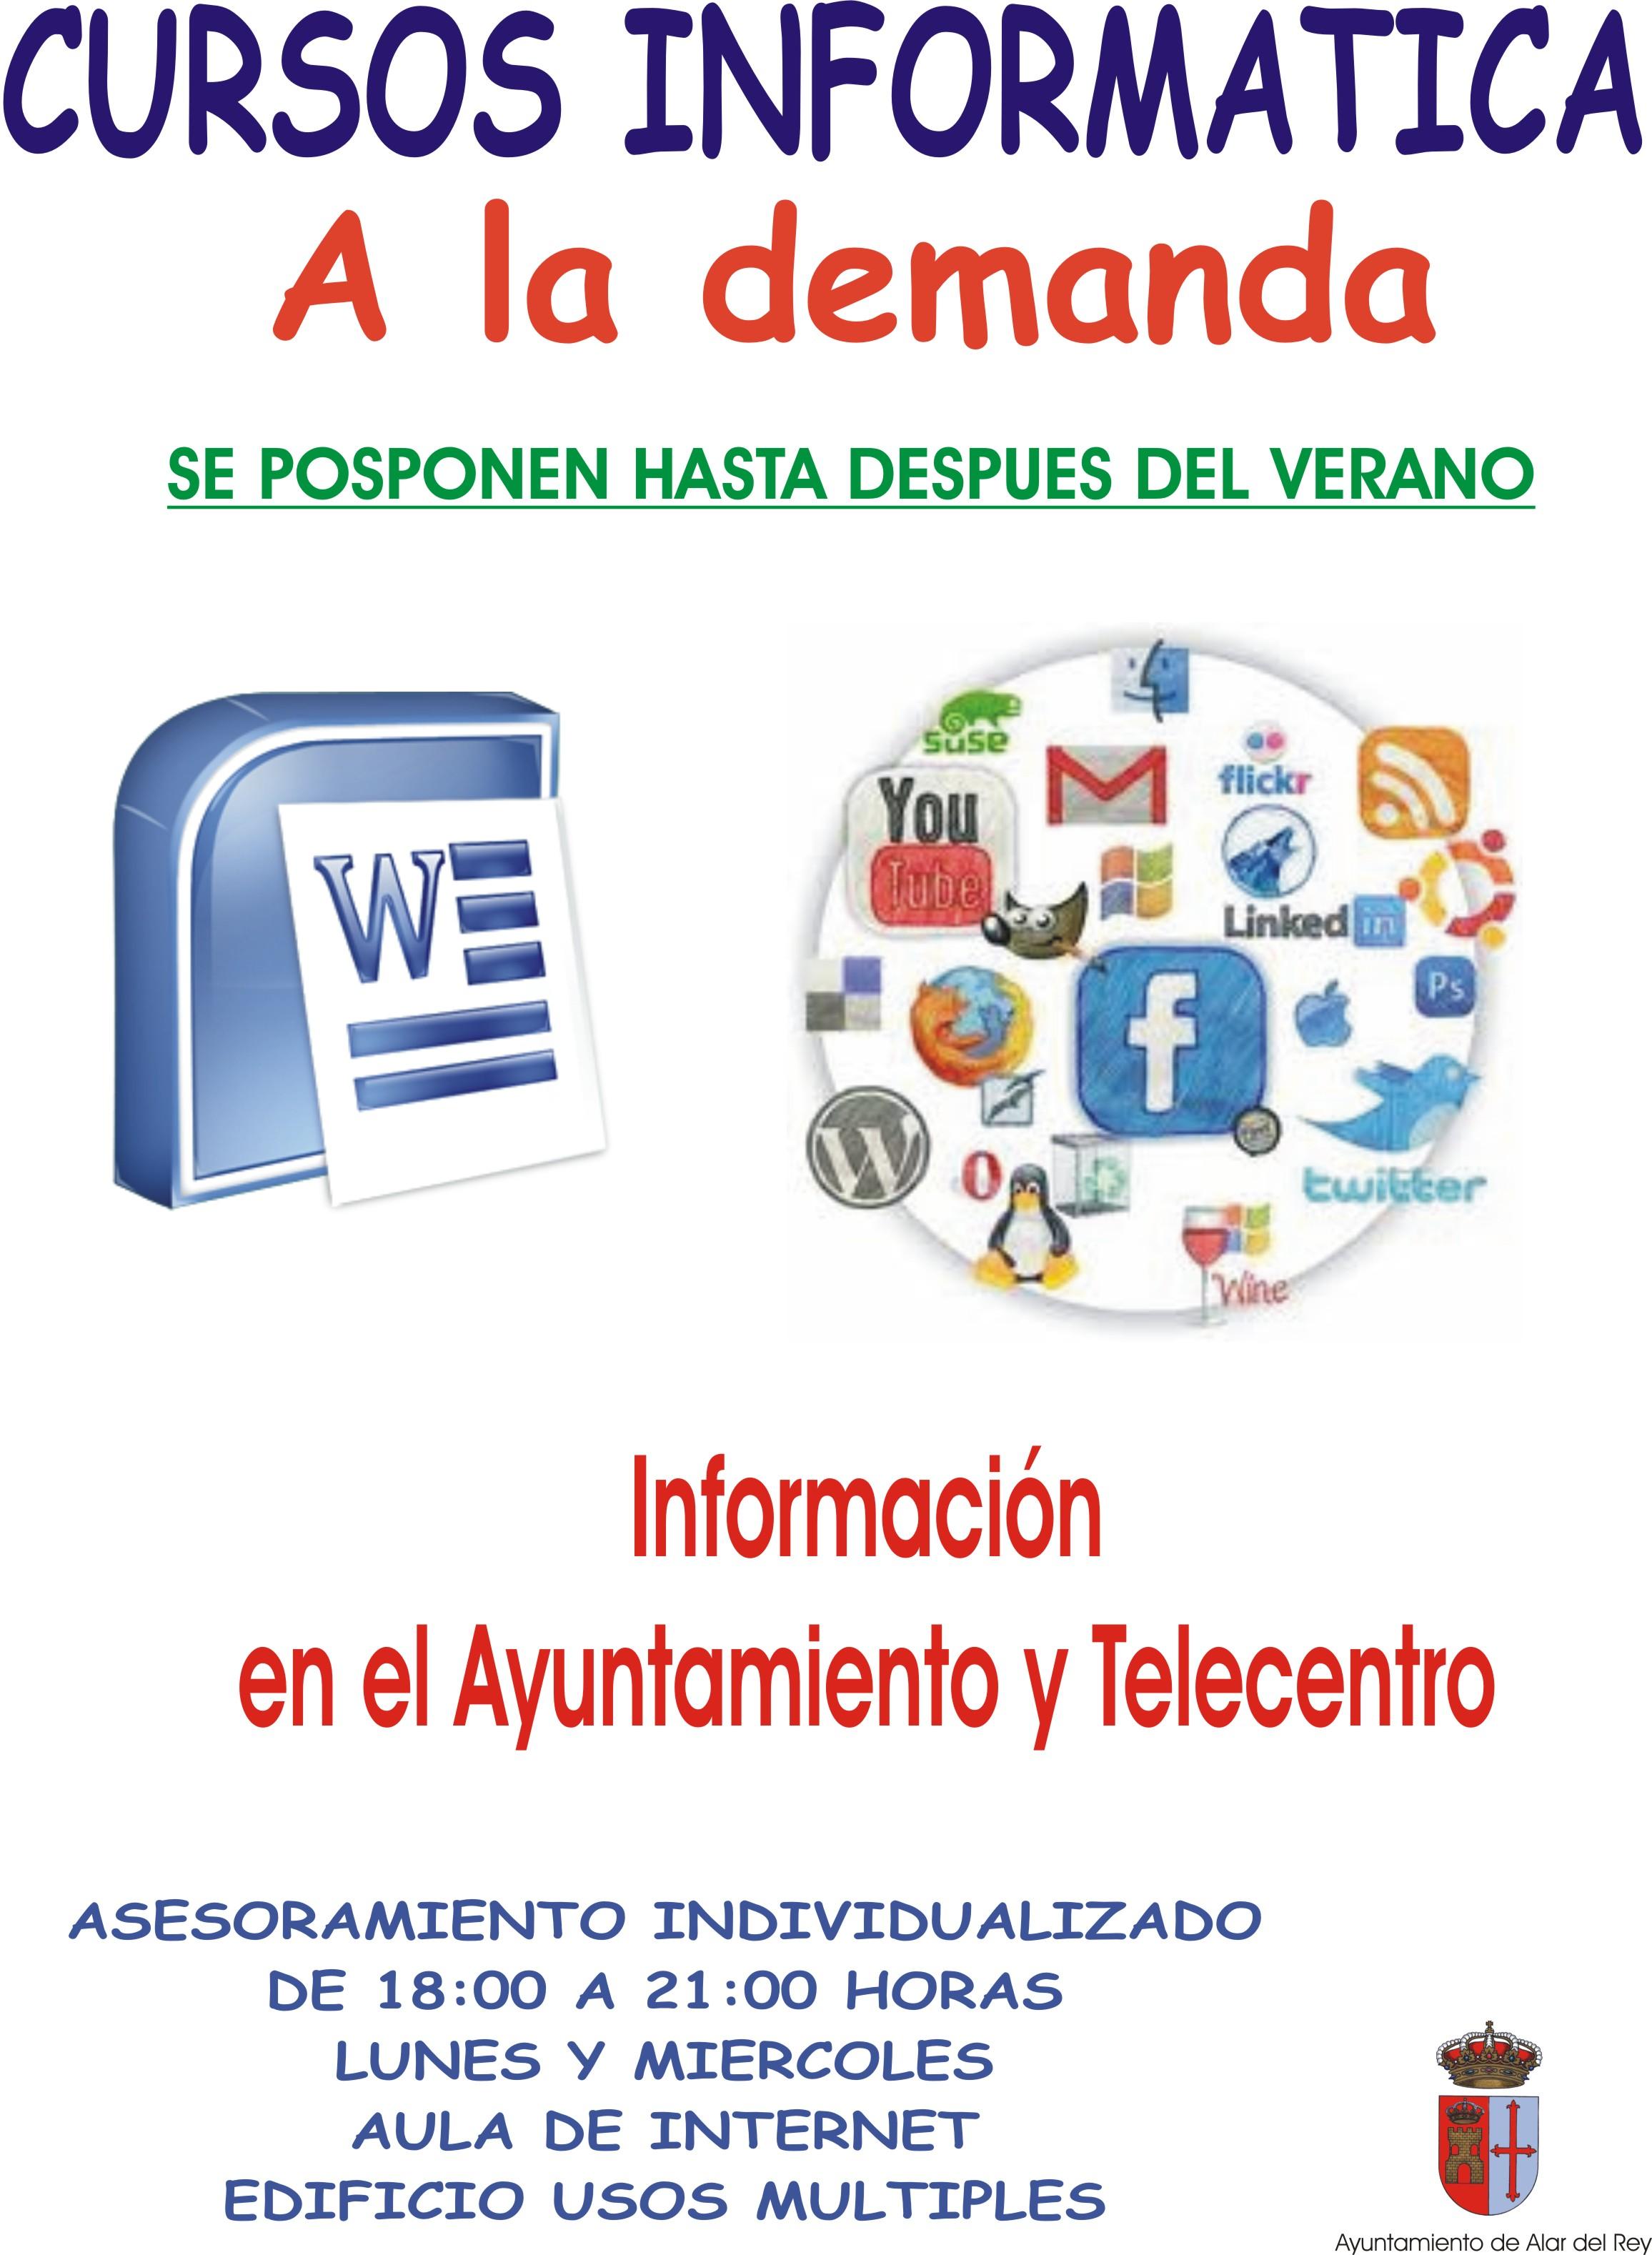 CURSOS ALFABETIZACION DIGITAL TELECENTRO, «CURSOS A LA DEMANDA»